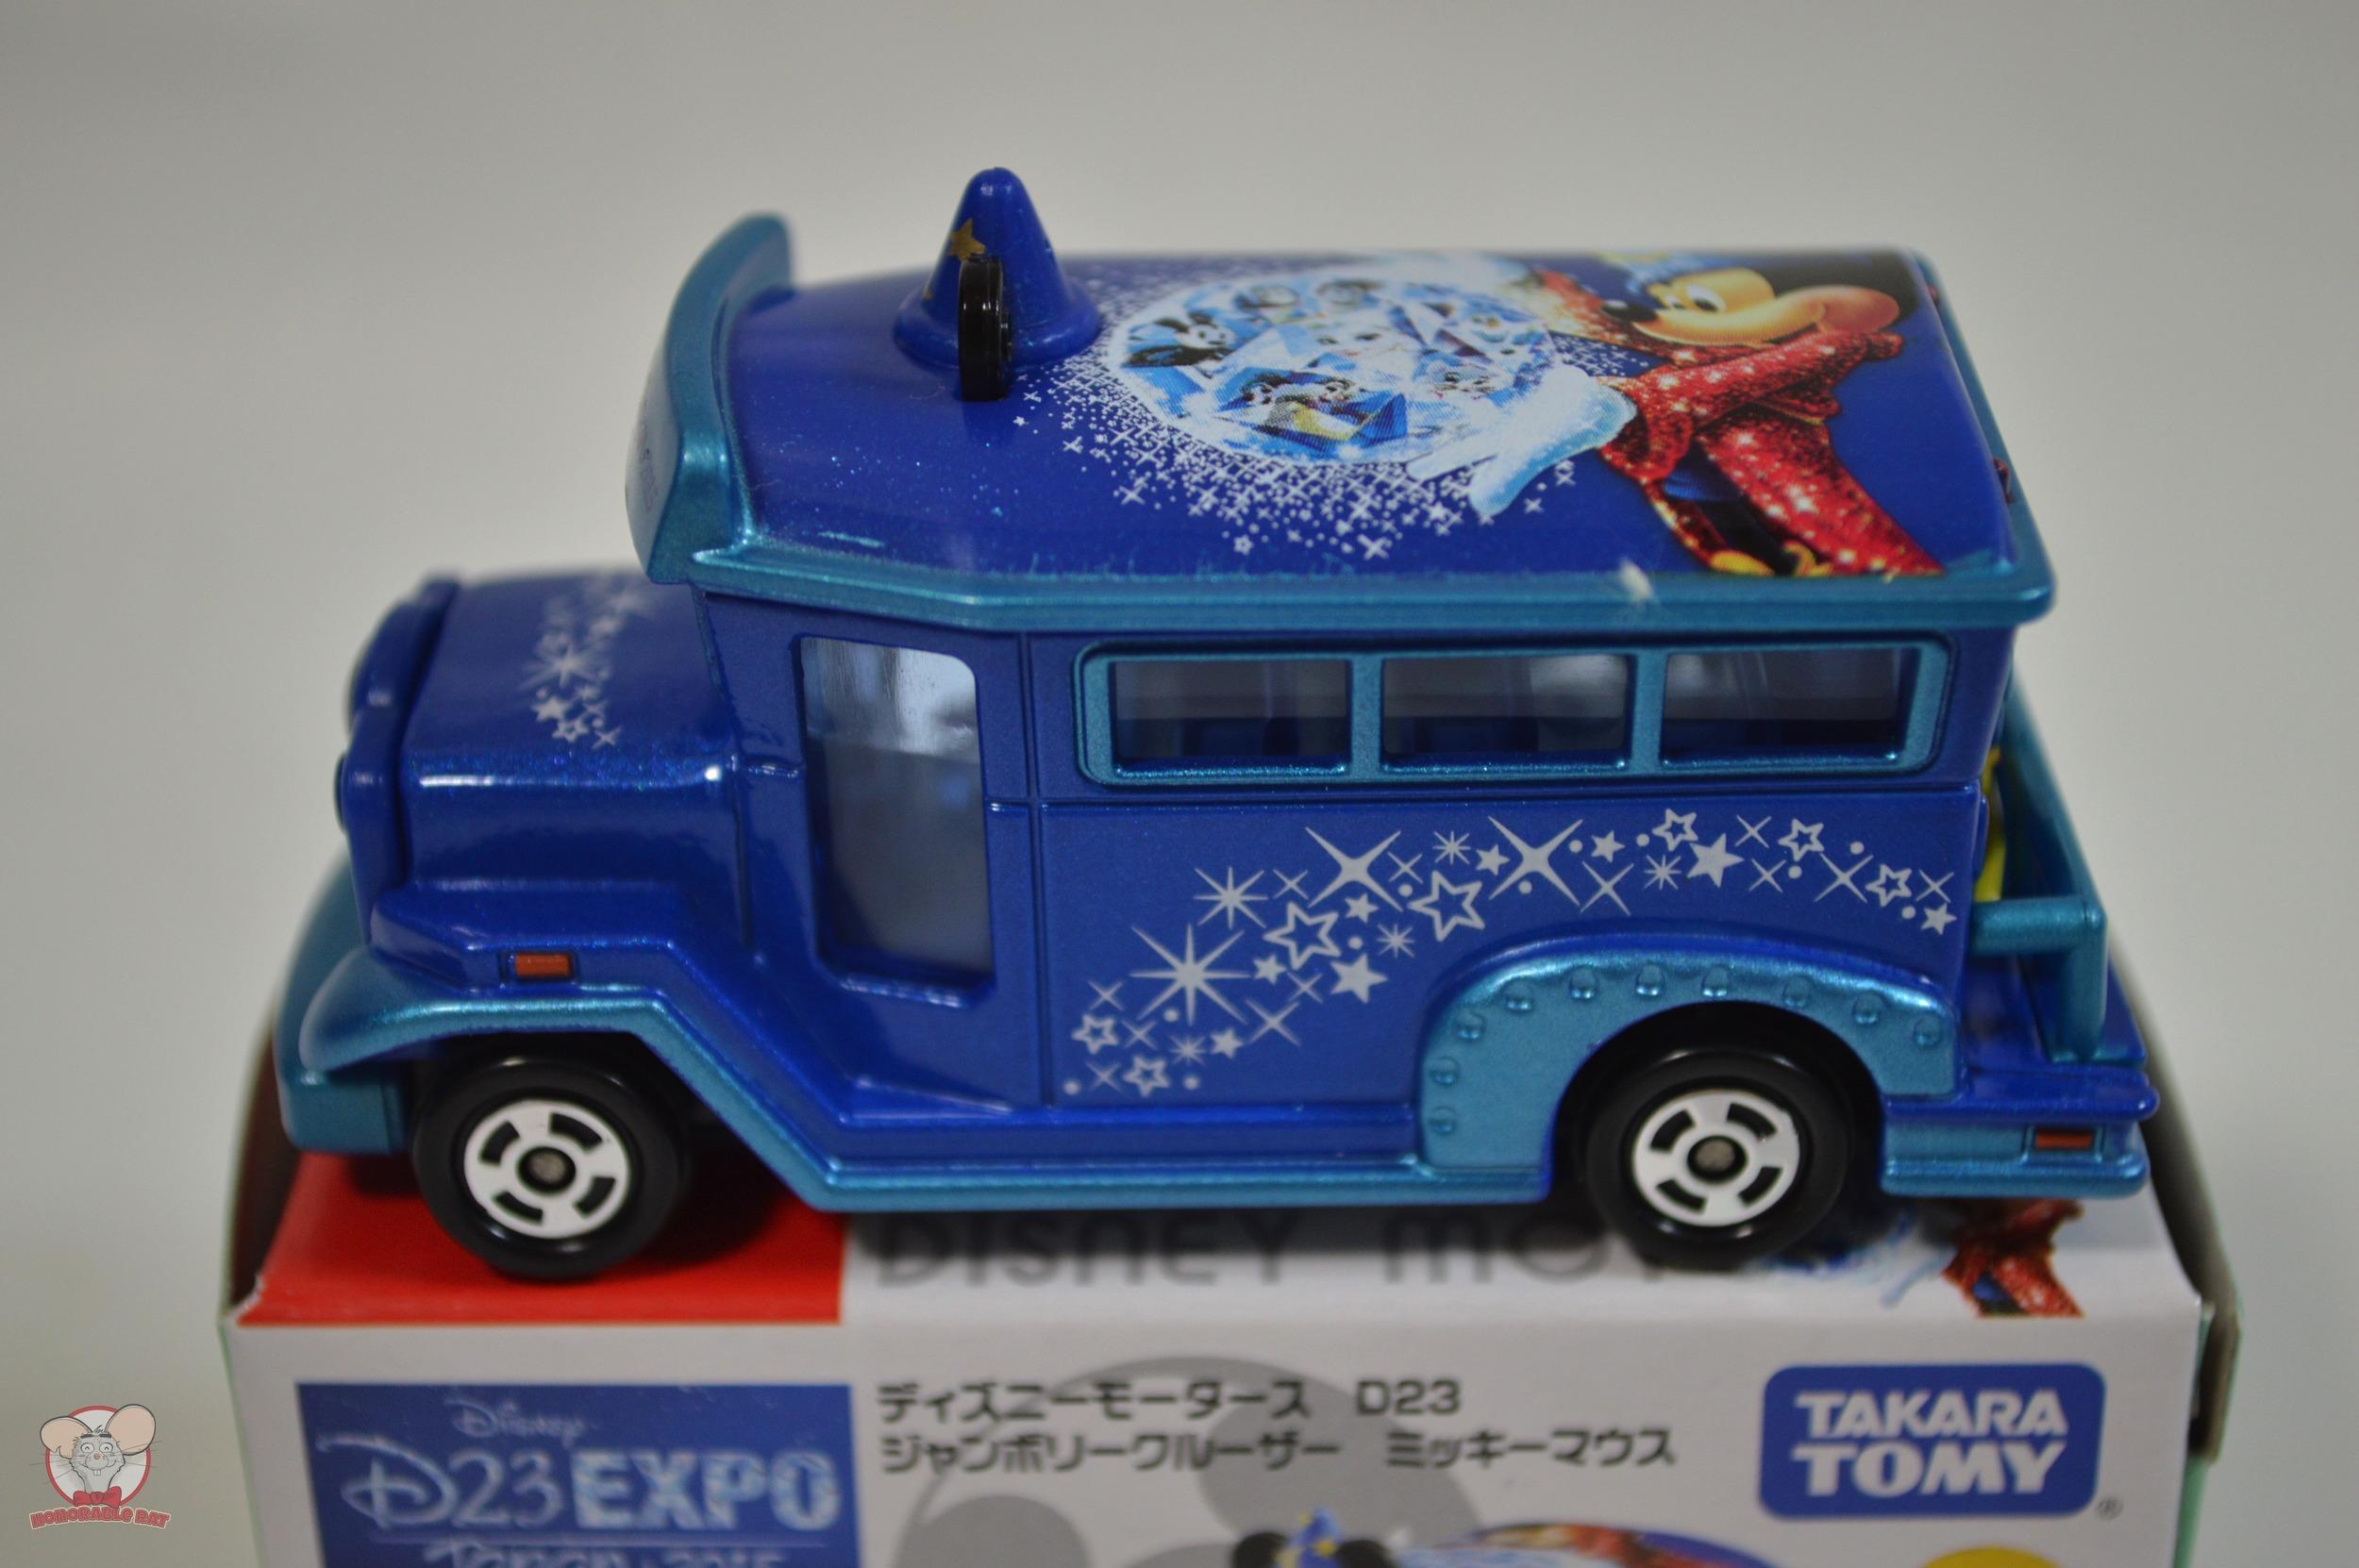 D23 Expo Japan 2015 Takara Tomy Fantasia Bus